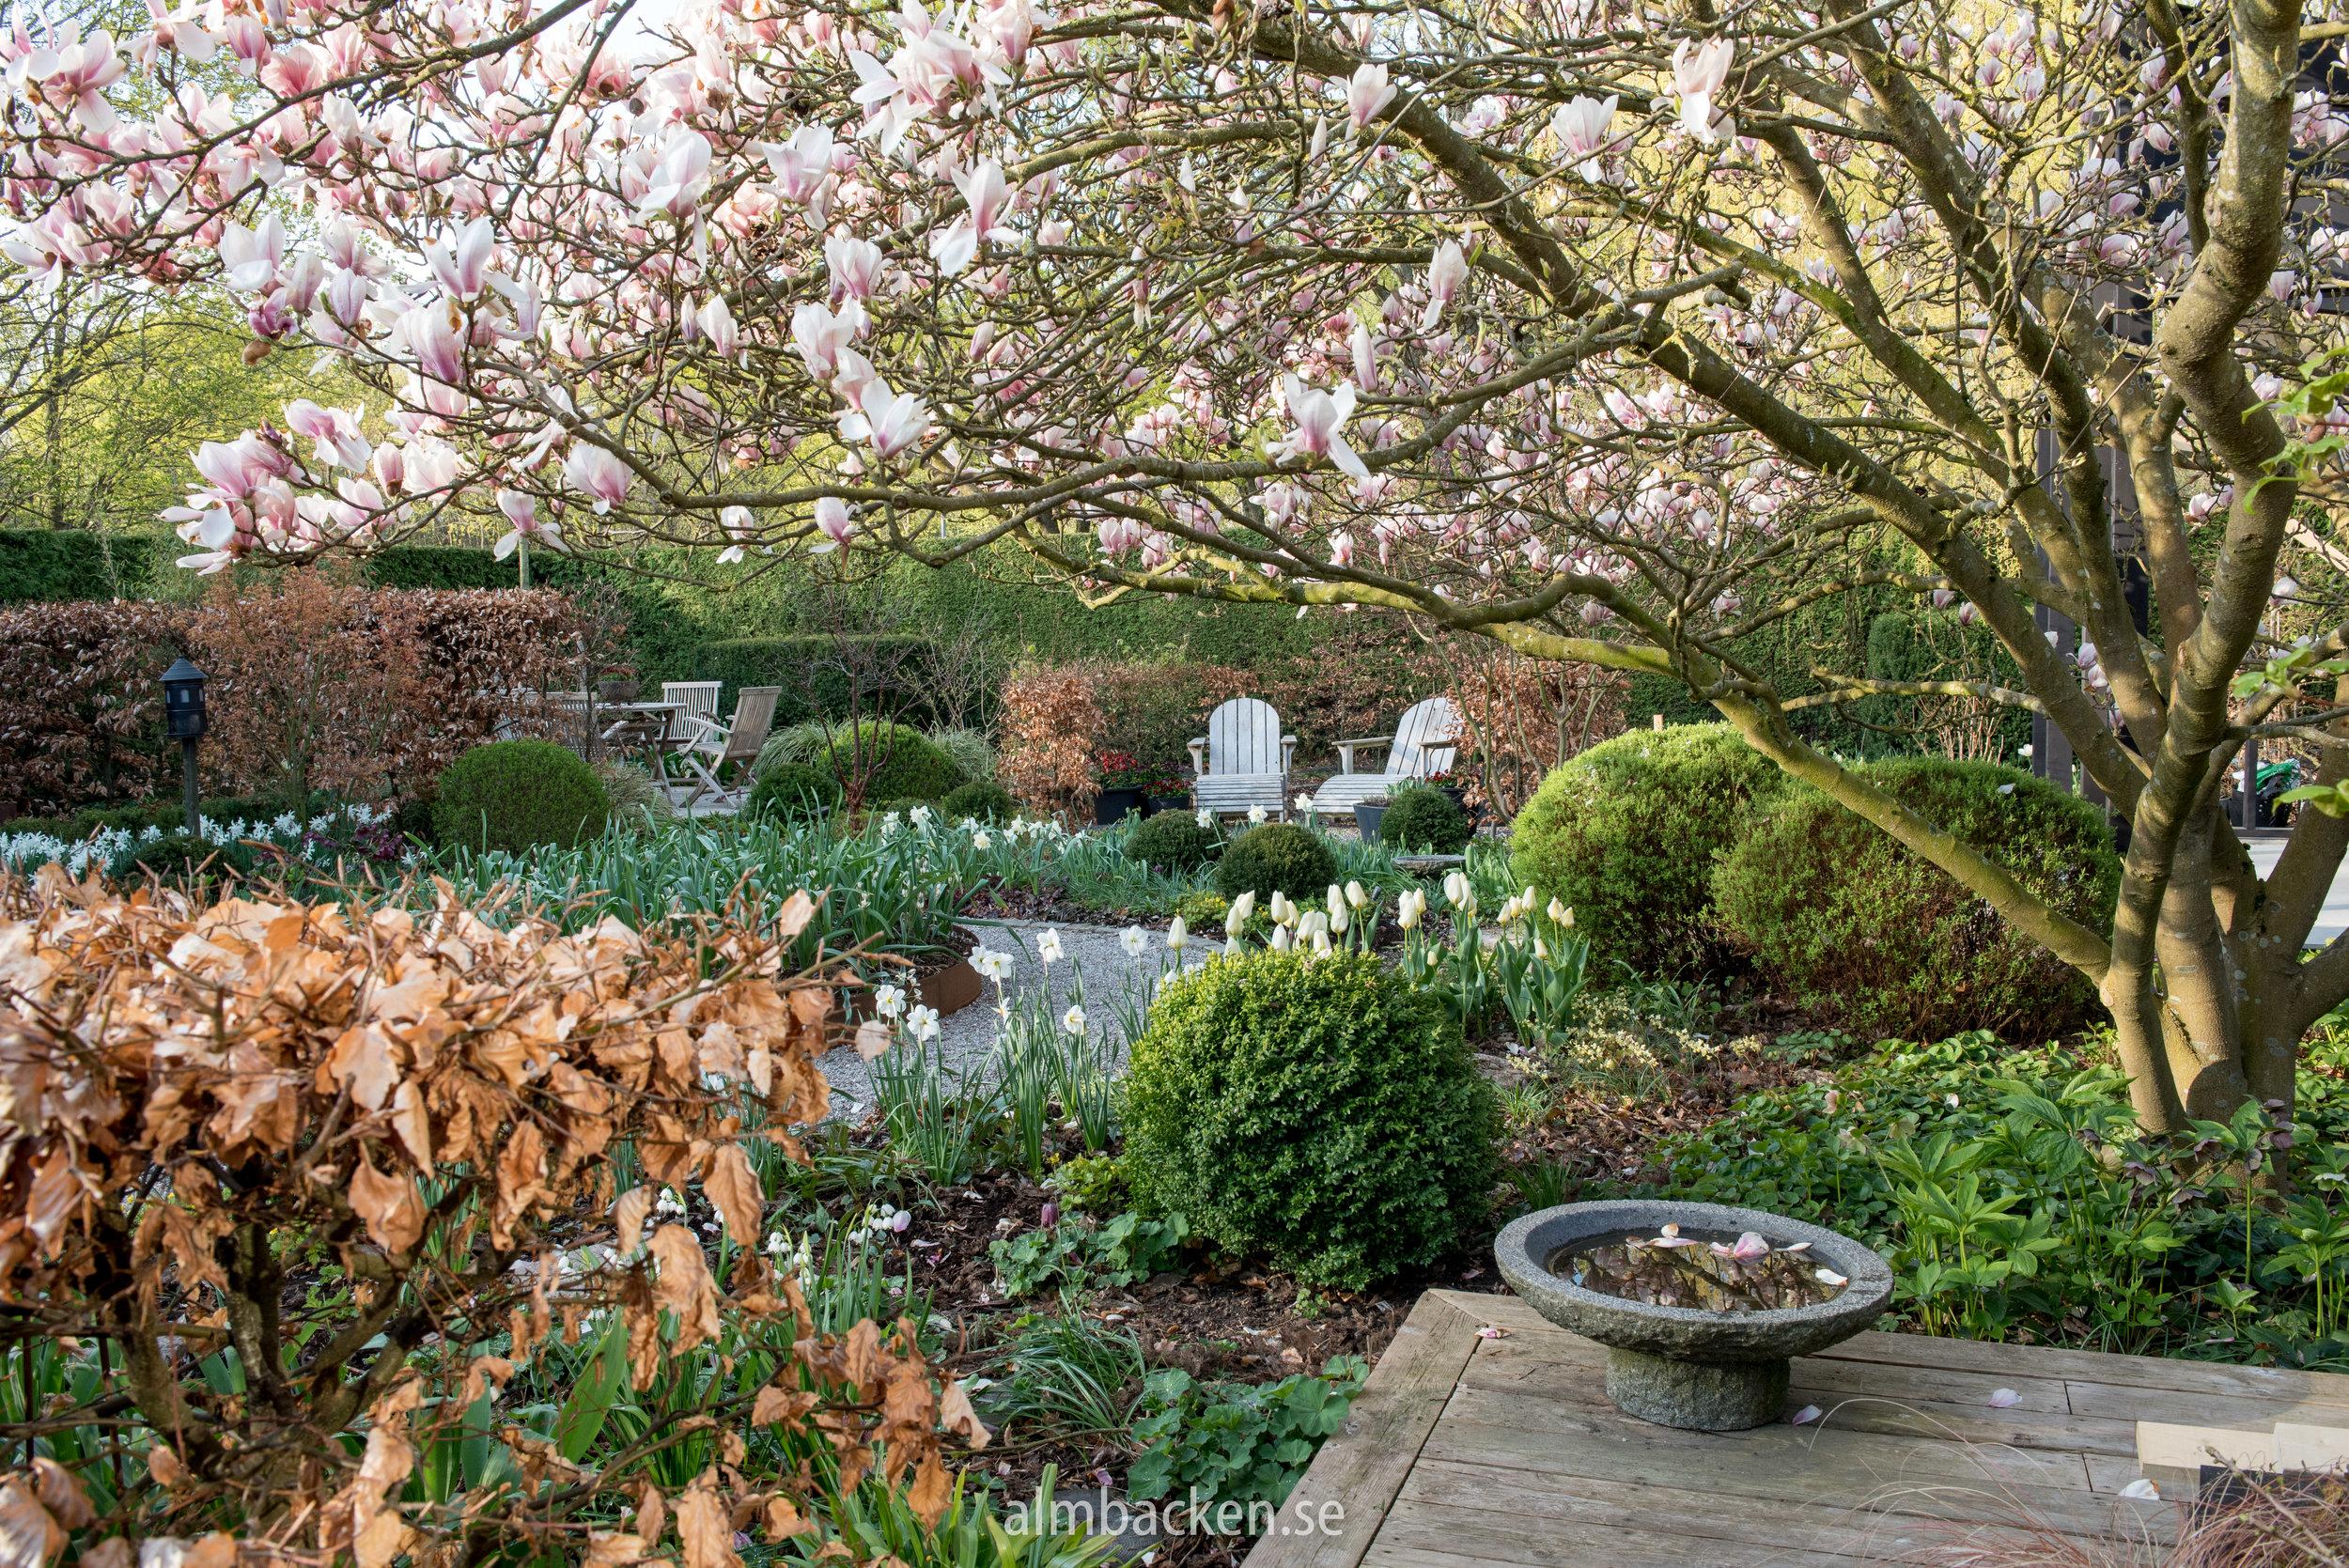 magnolia-tulipa-purissima-almbacken-tradgardsdesign.jpg